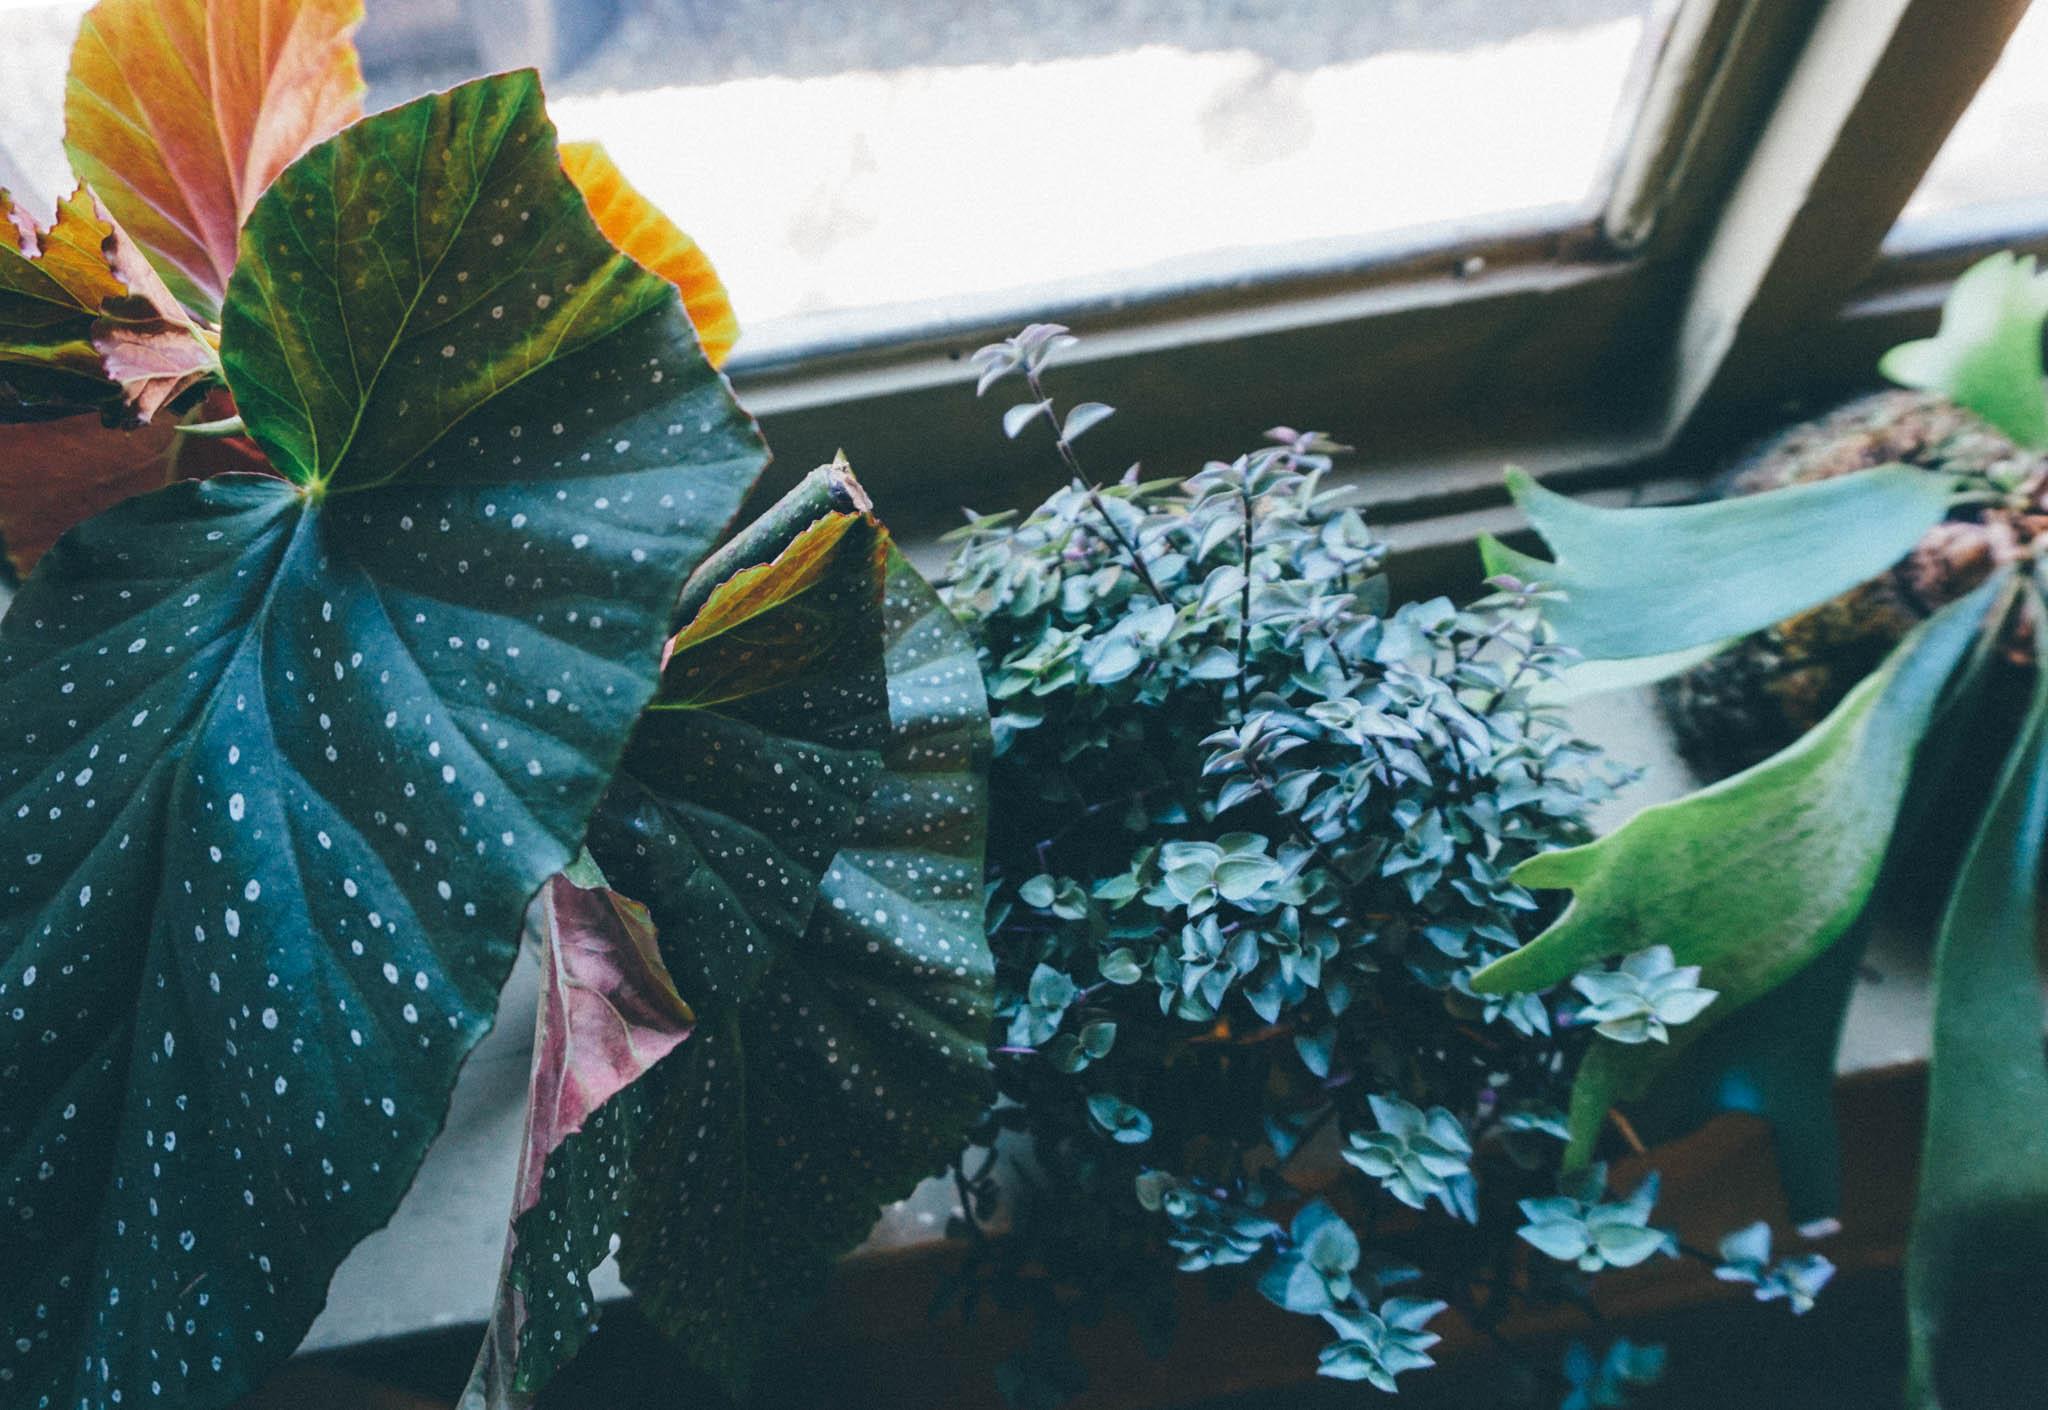 Angel Wing Begonia, Wandering Jew, Staghorn Fern Kokedama